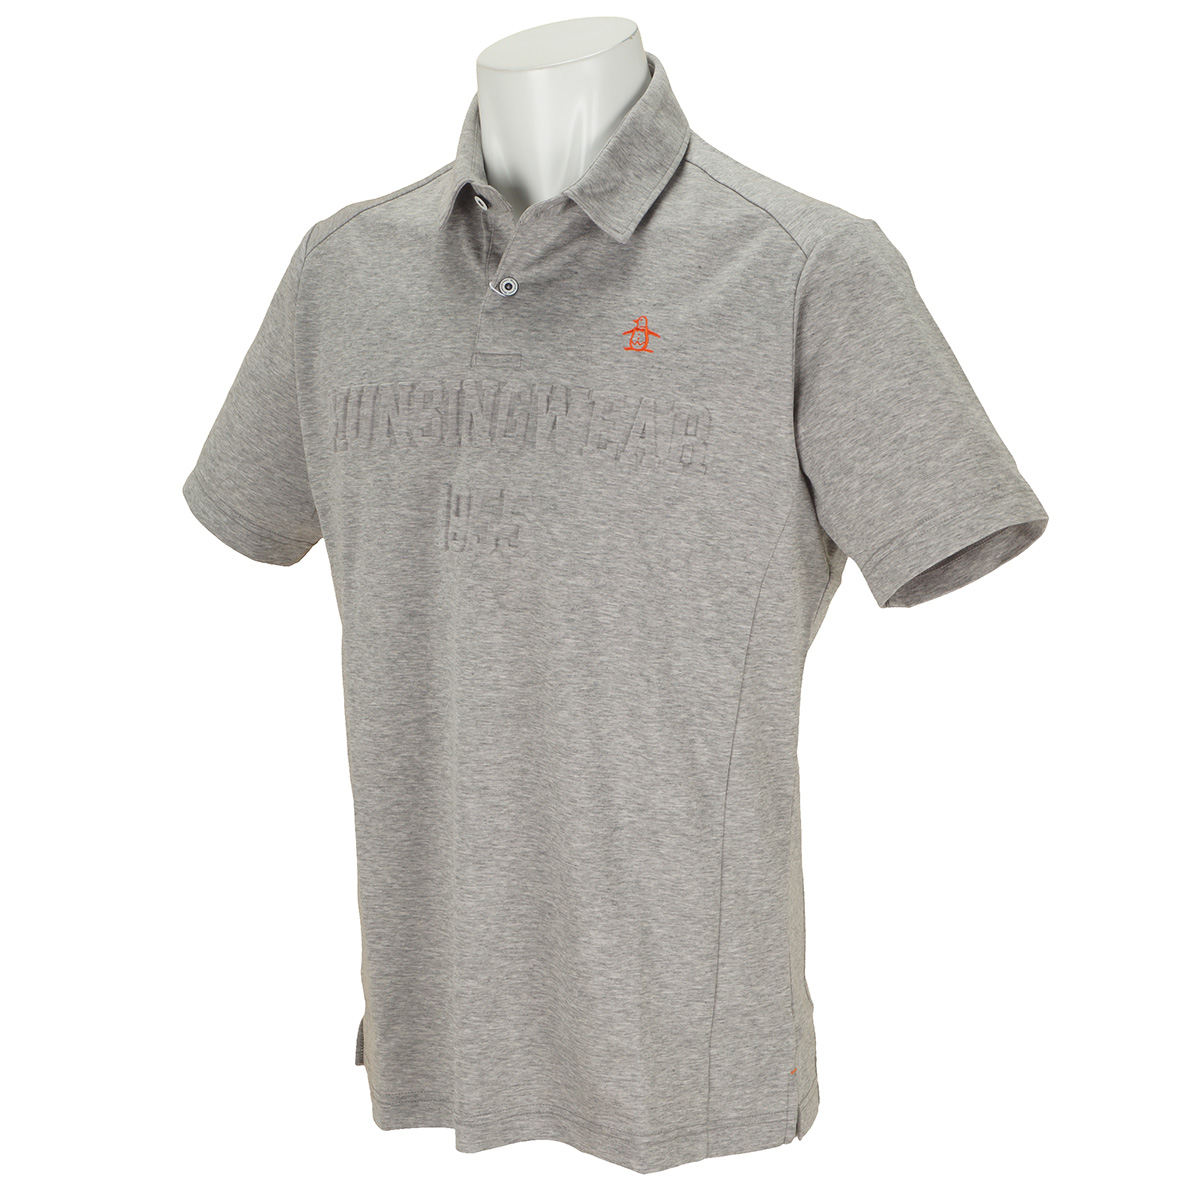 SUNSCREENデボスロゴ半袖ポロシャツ